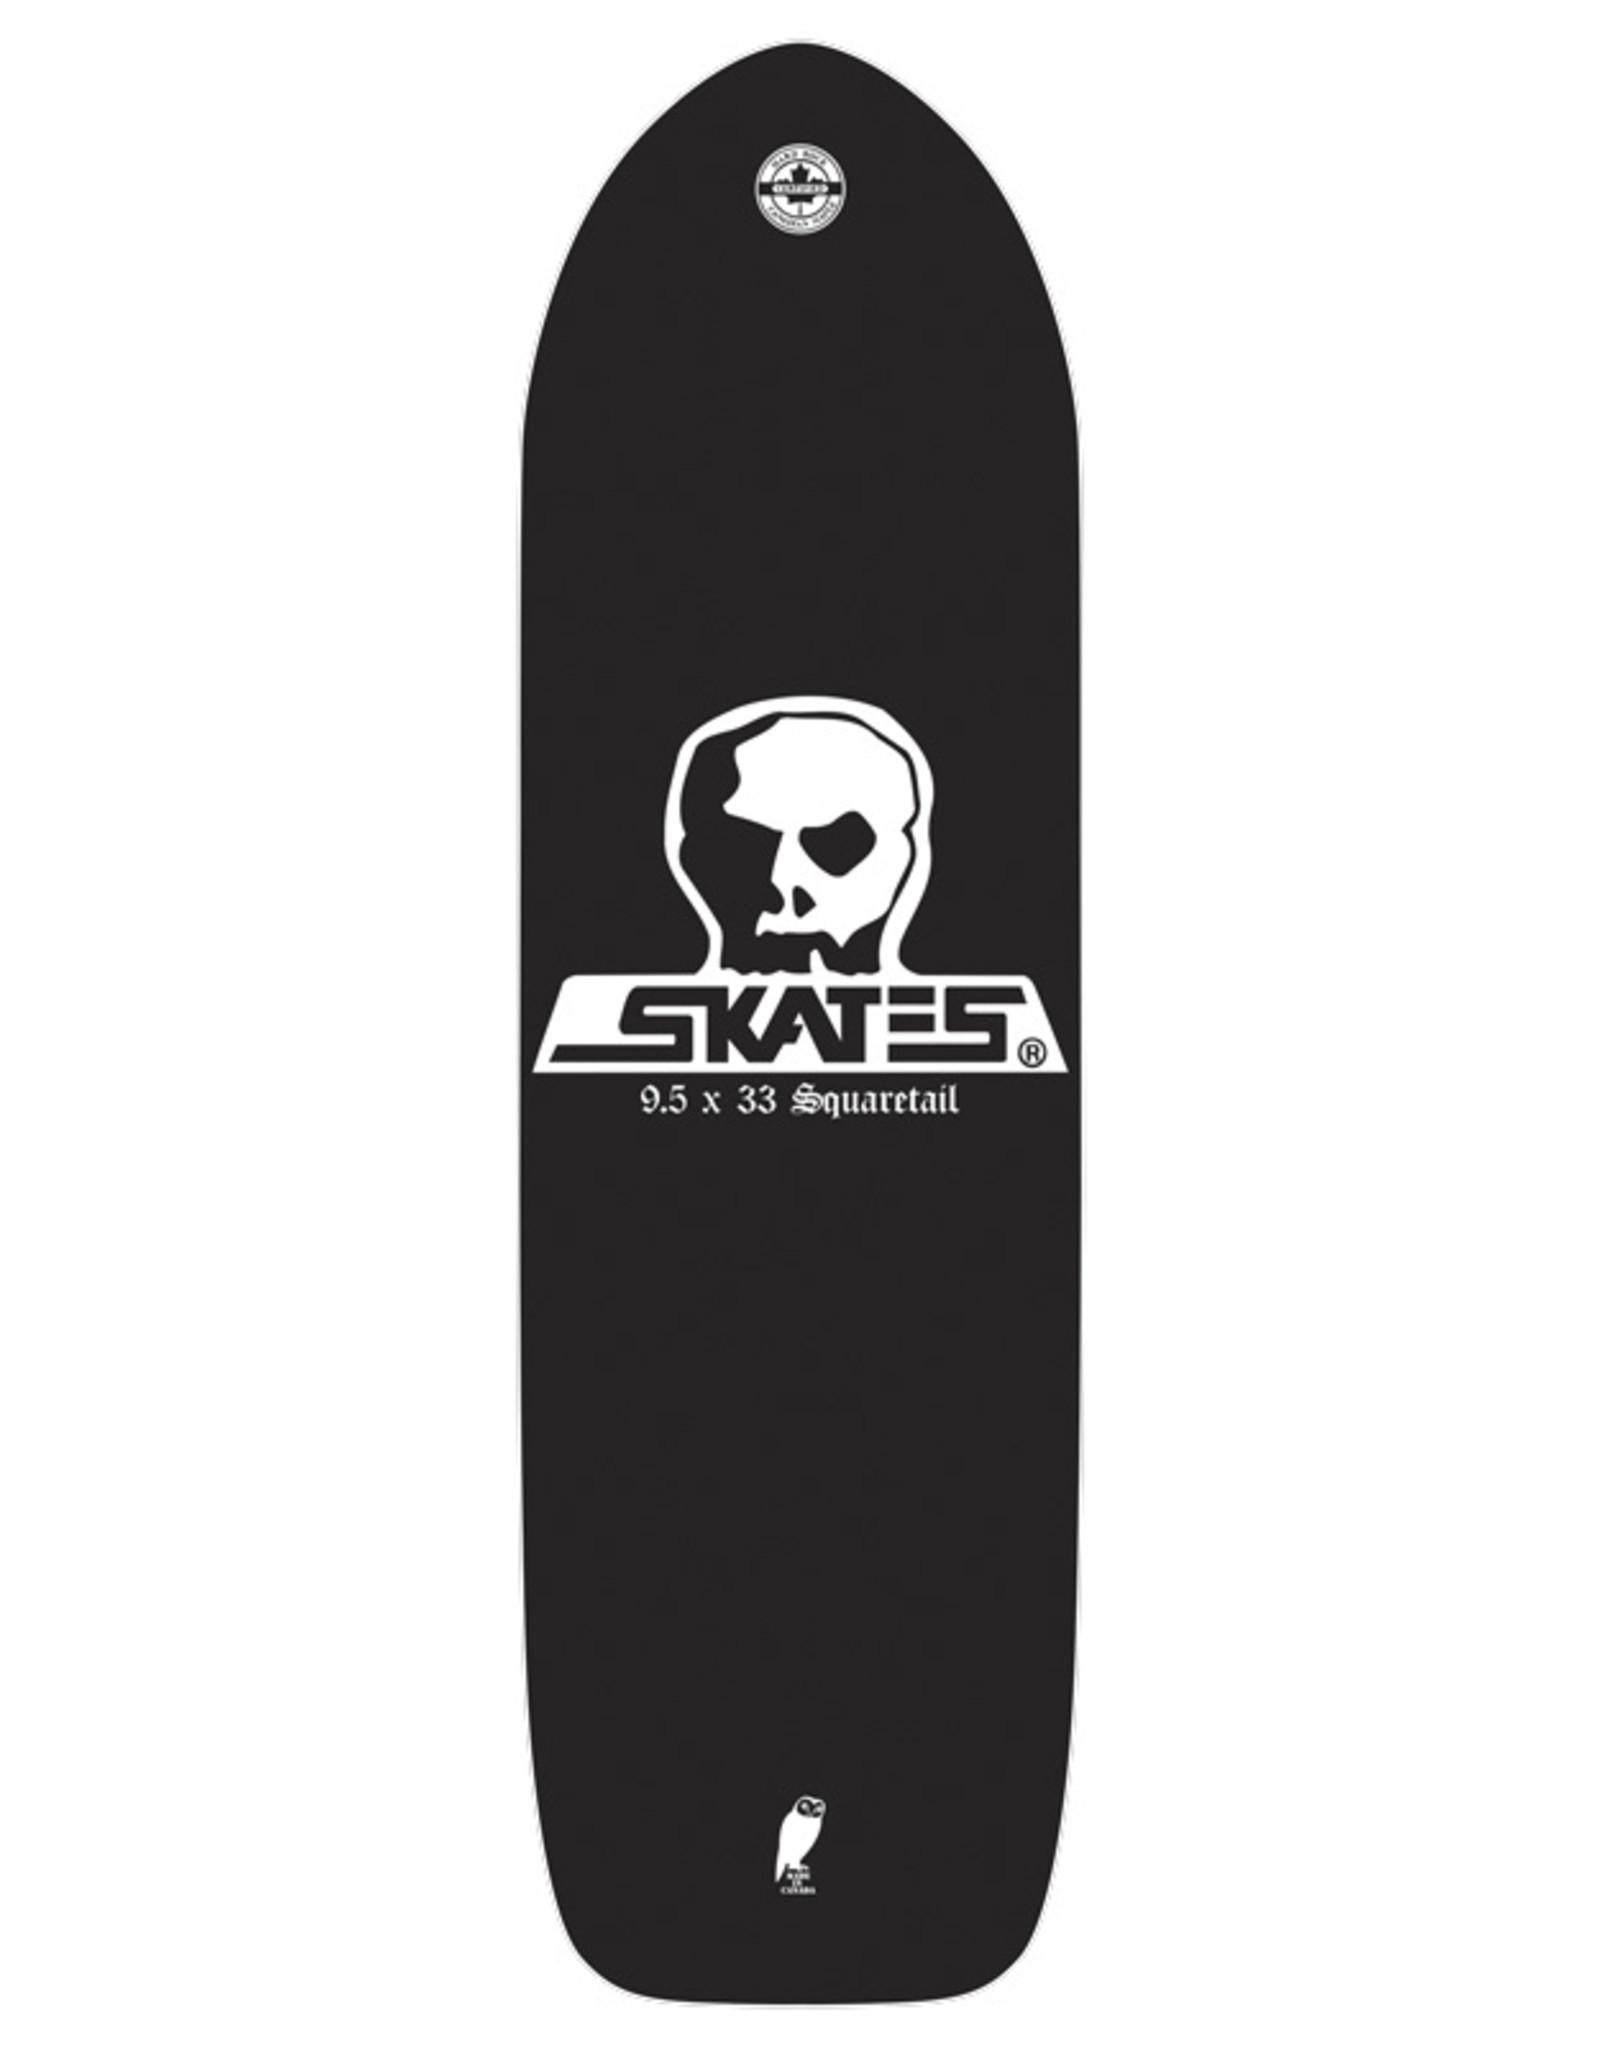 Skull Skates SKULL DECK DIEHARD SQUARETAIL 9.5x33